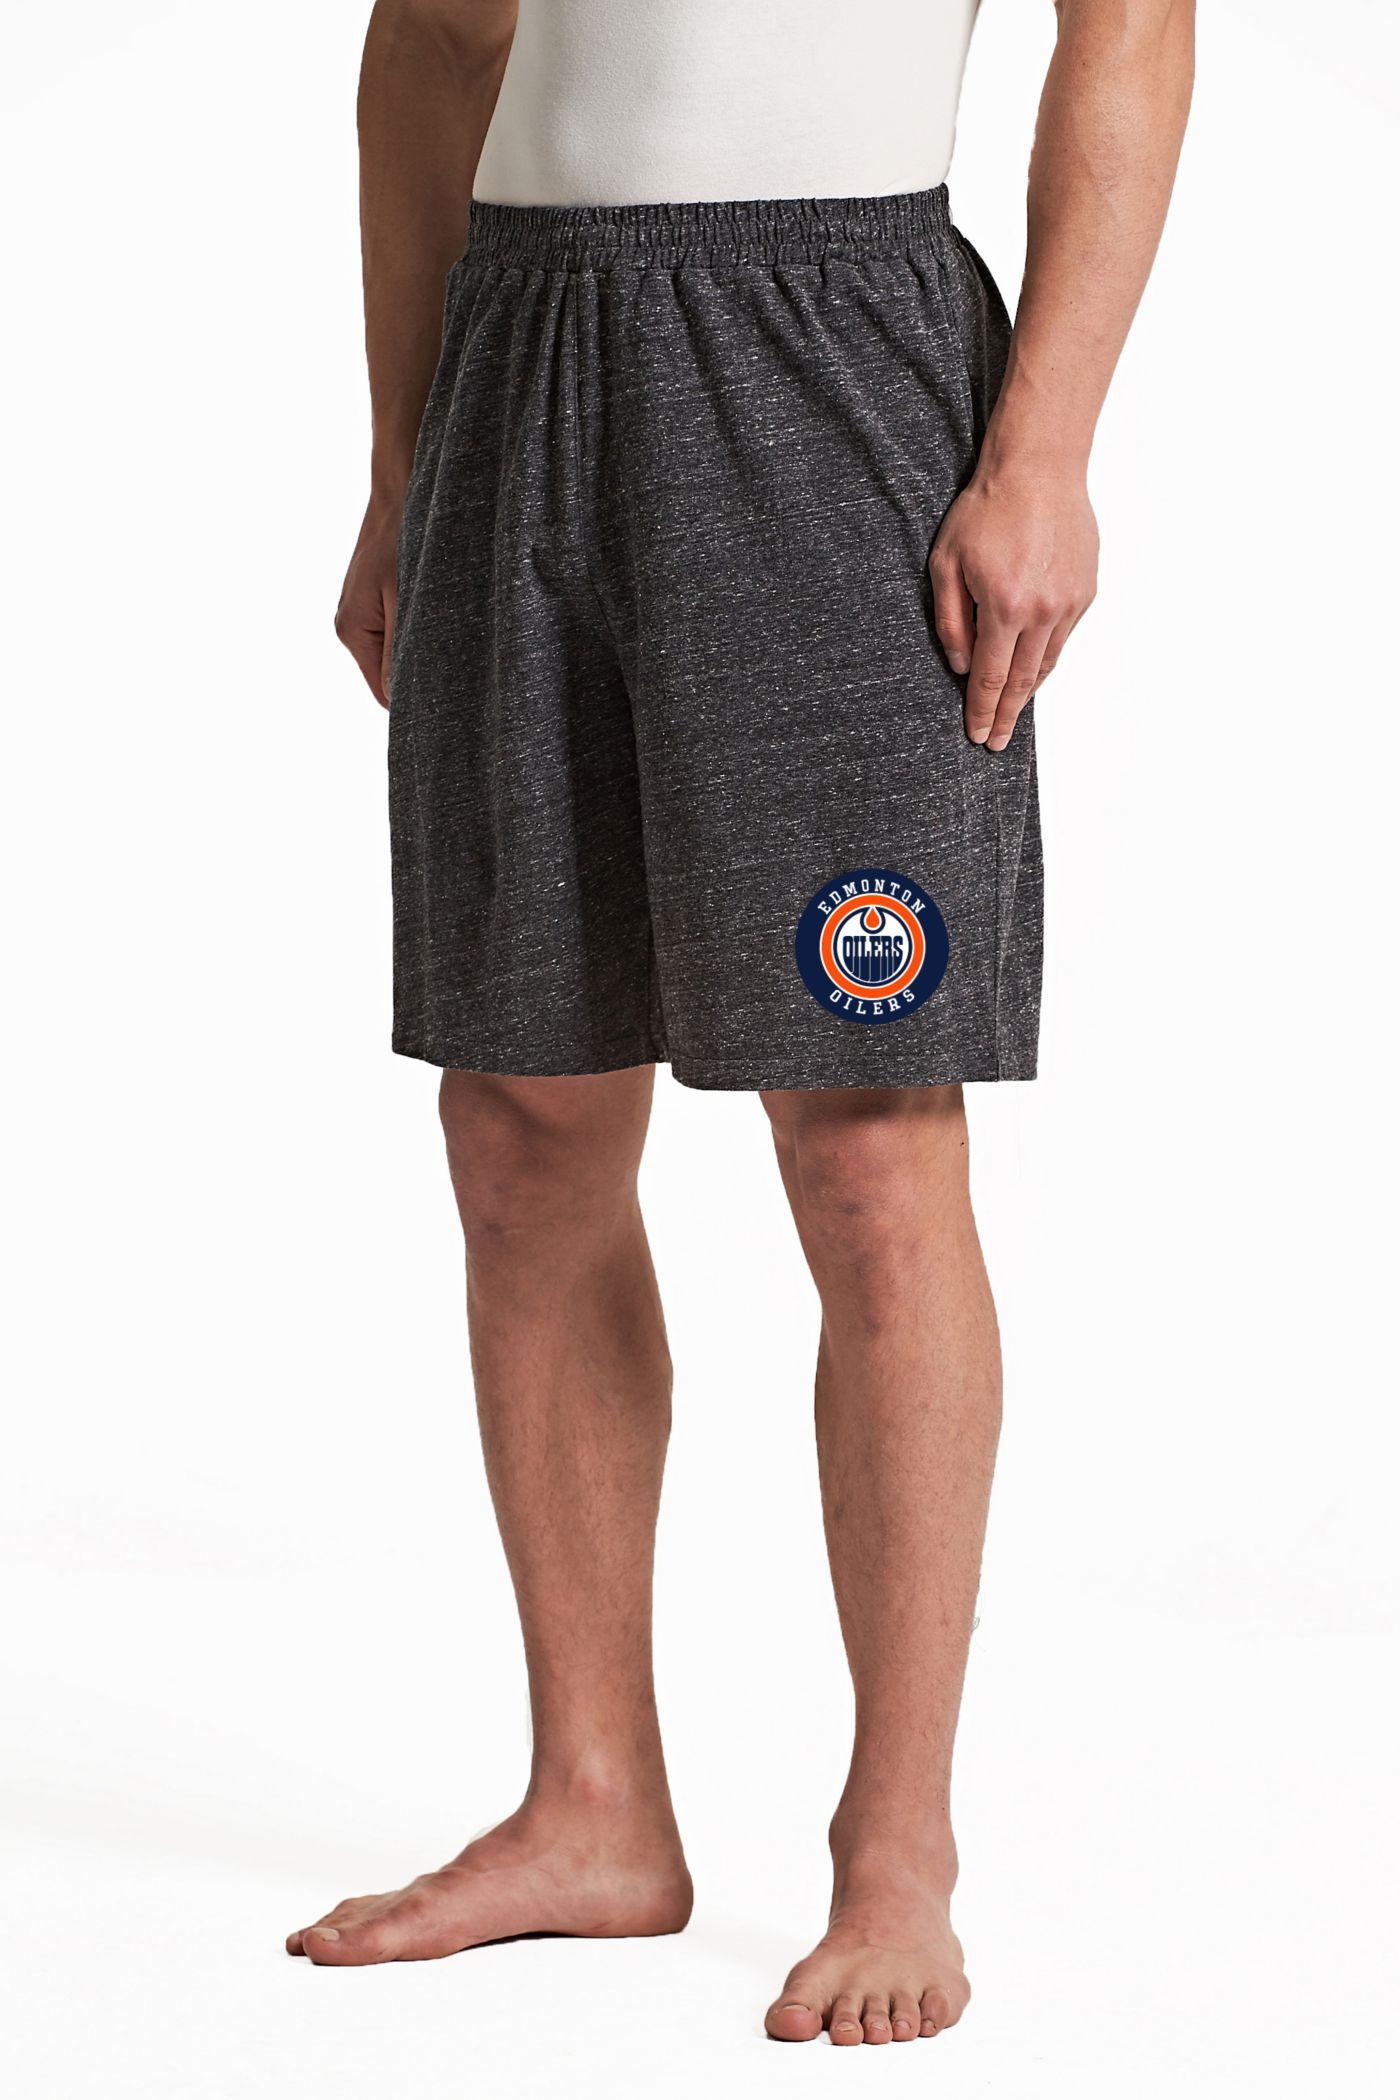 Concepts Sport Men's Edmonton Oilers Pitch Grey Shorts